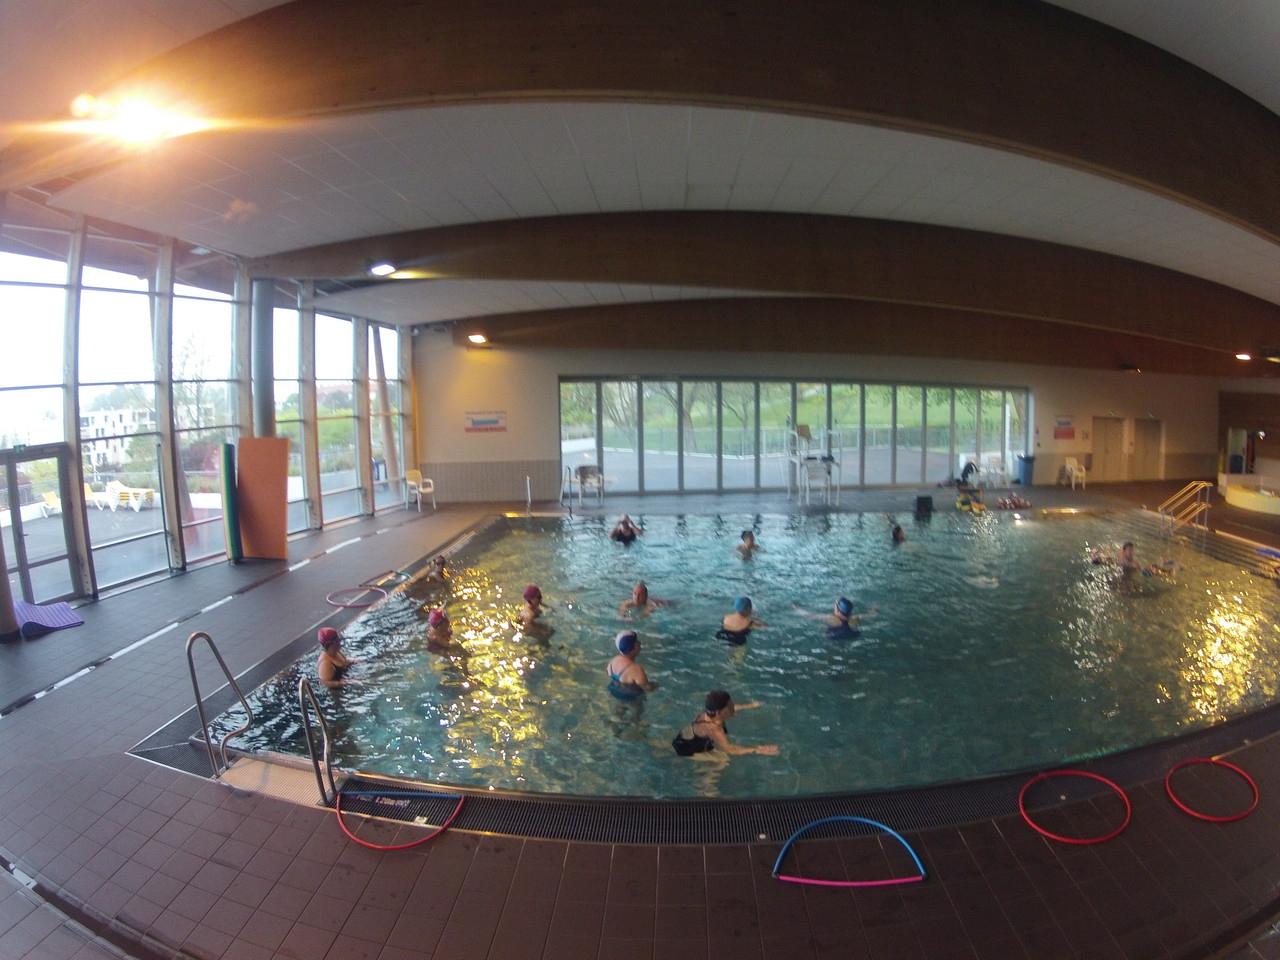 Centre Aquatique - Bayonne - Site De Aquazen ! intérieur Centre Aquatique Des Hauts De Bayonne Piscine Bayonne